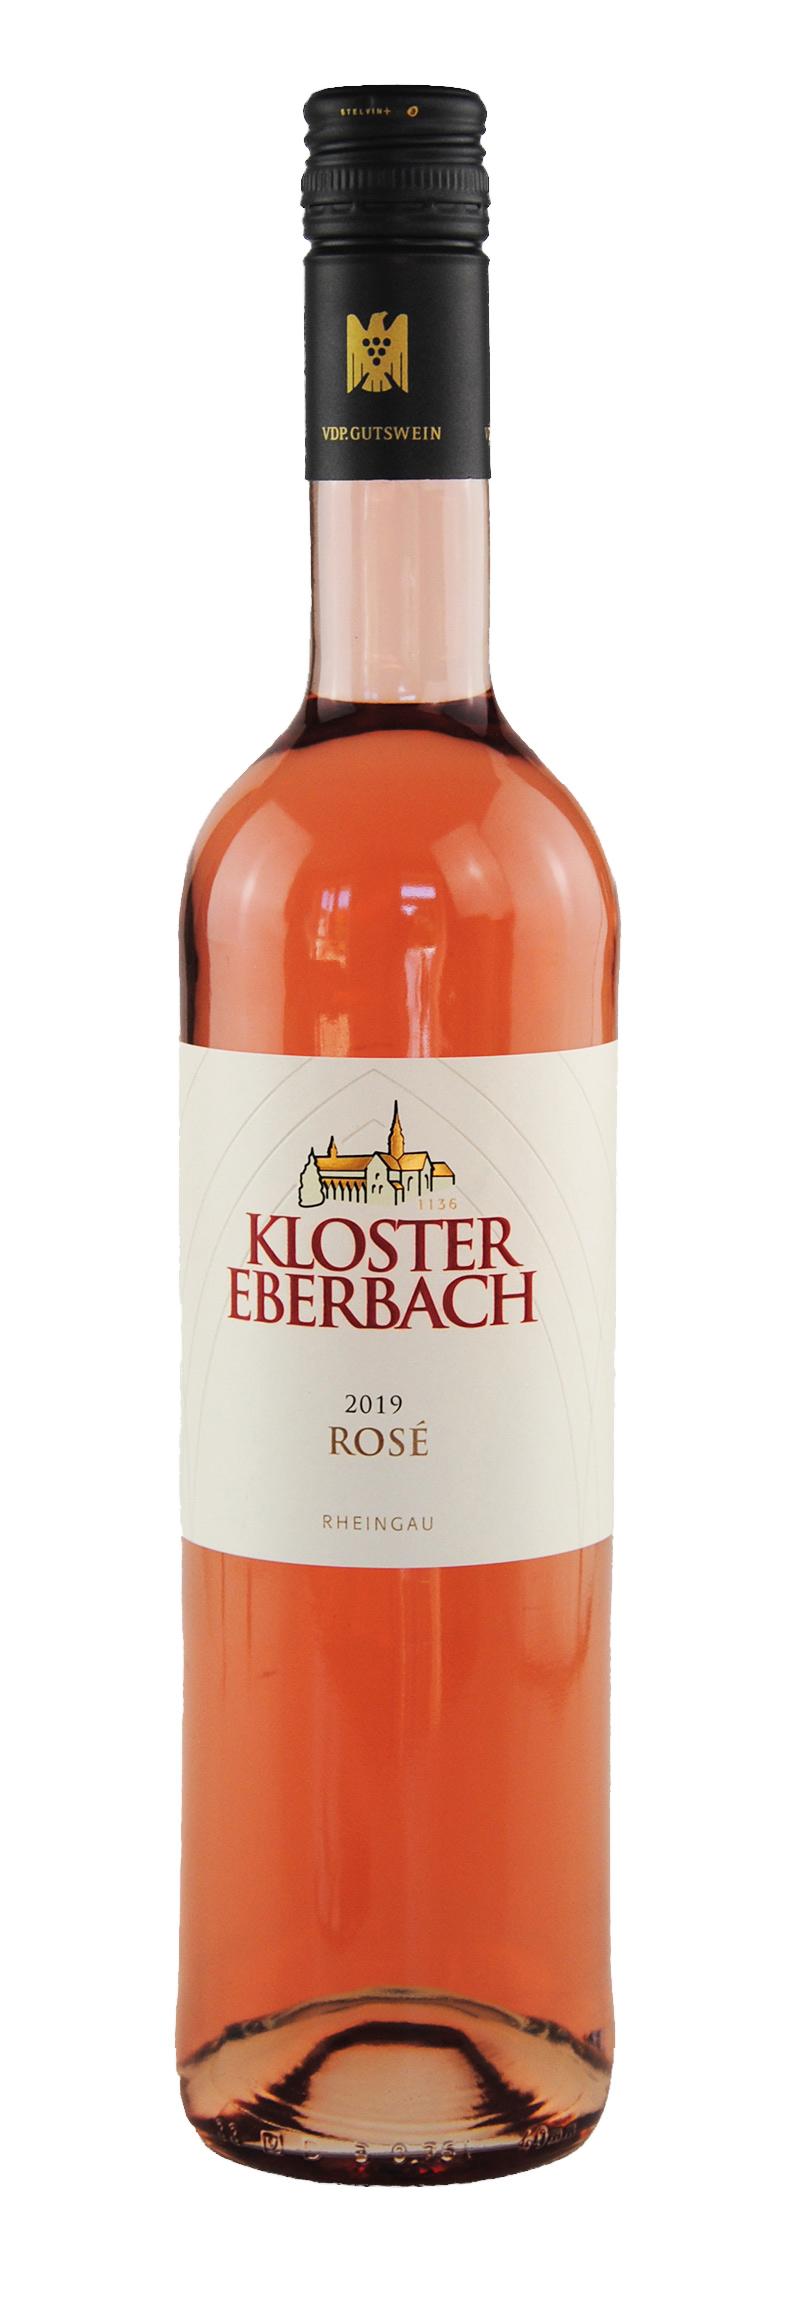 FINESSE, Magazin, Food, Gourmet, Wein, Kloster Eberbach, Rose